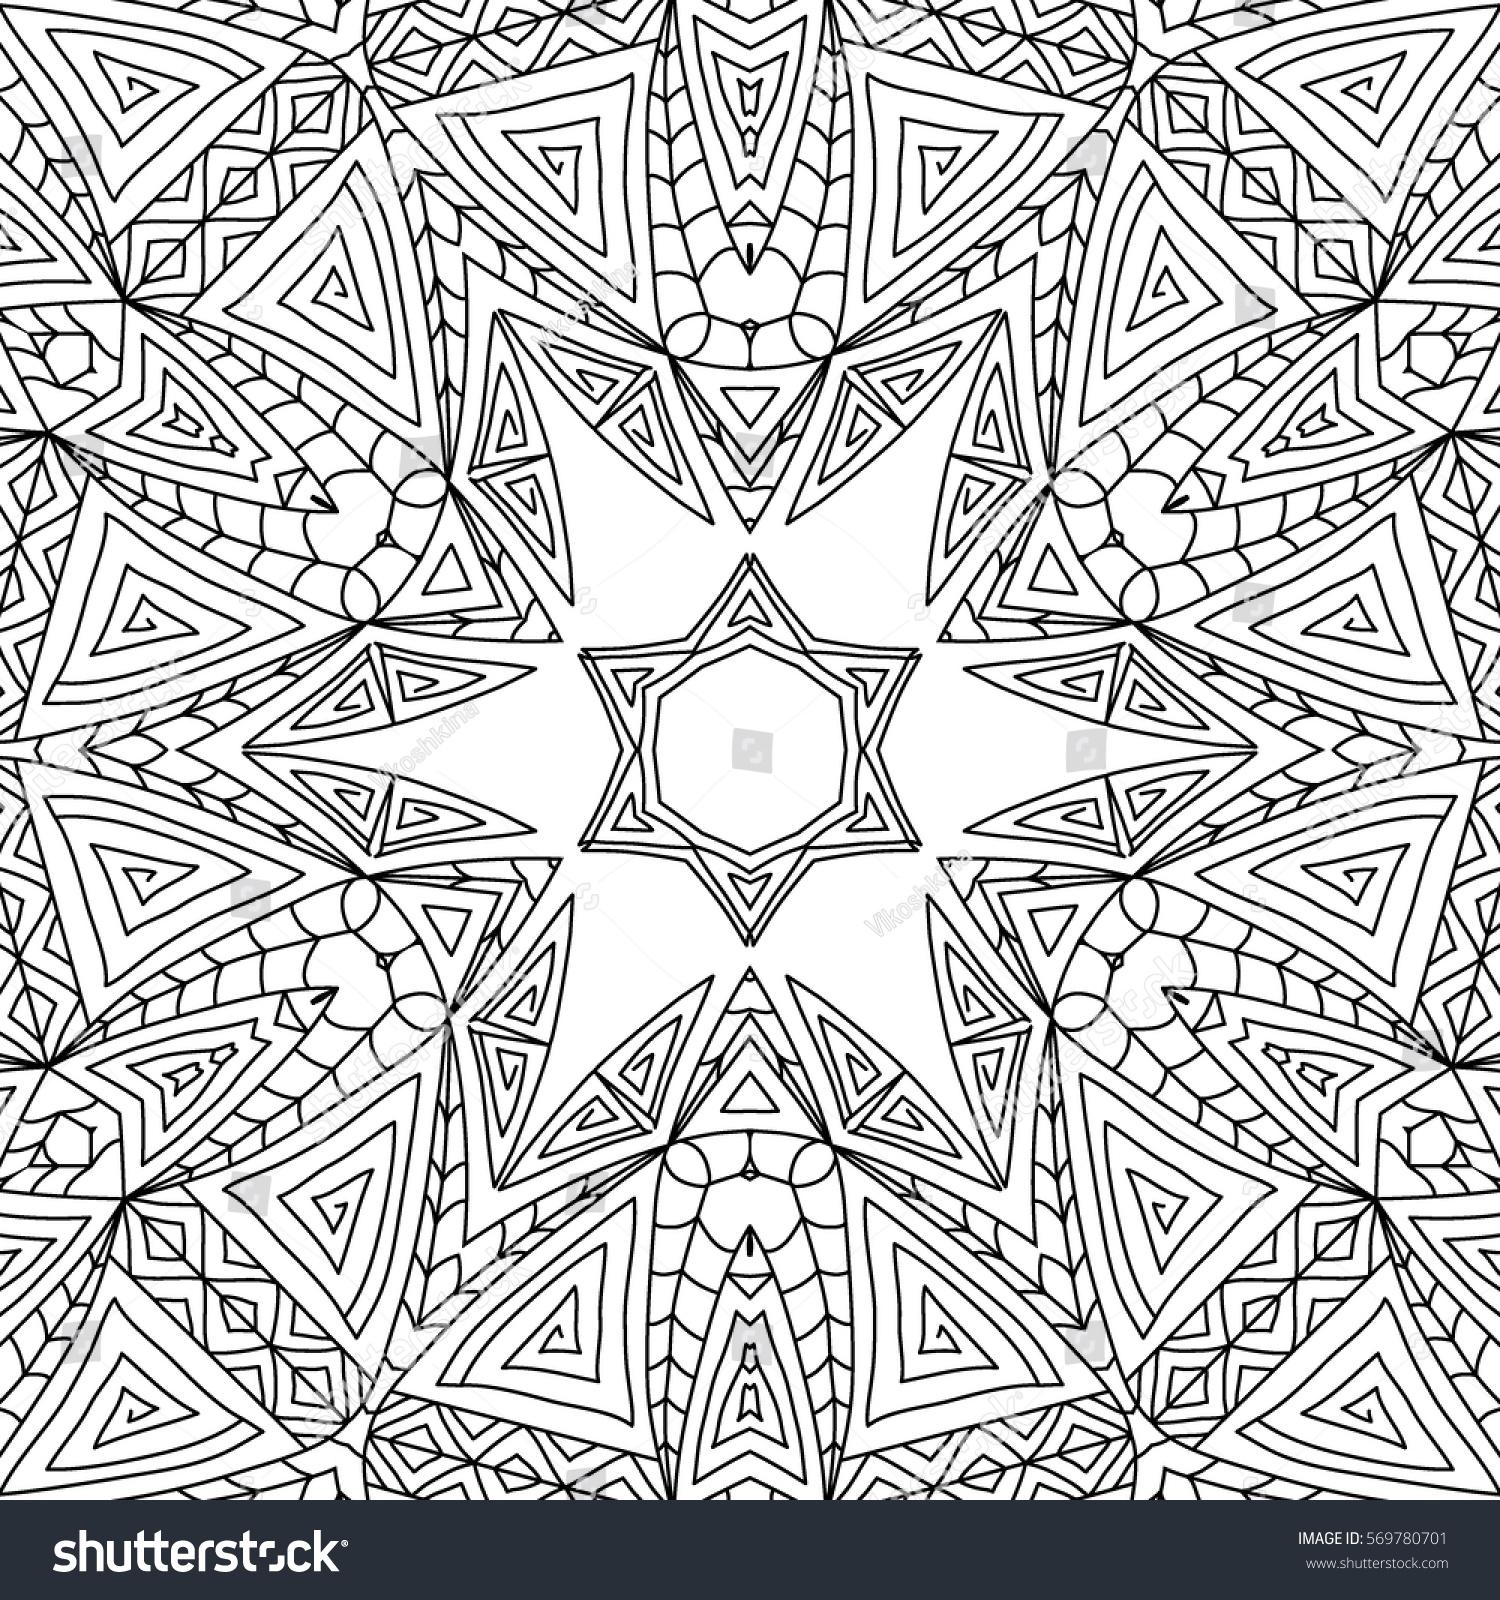 adult coloring book mandala ornament for textile fabric wallpaper - Coloring Book Wallpaper